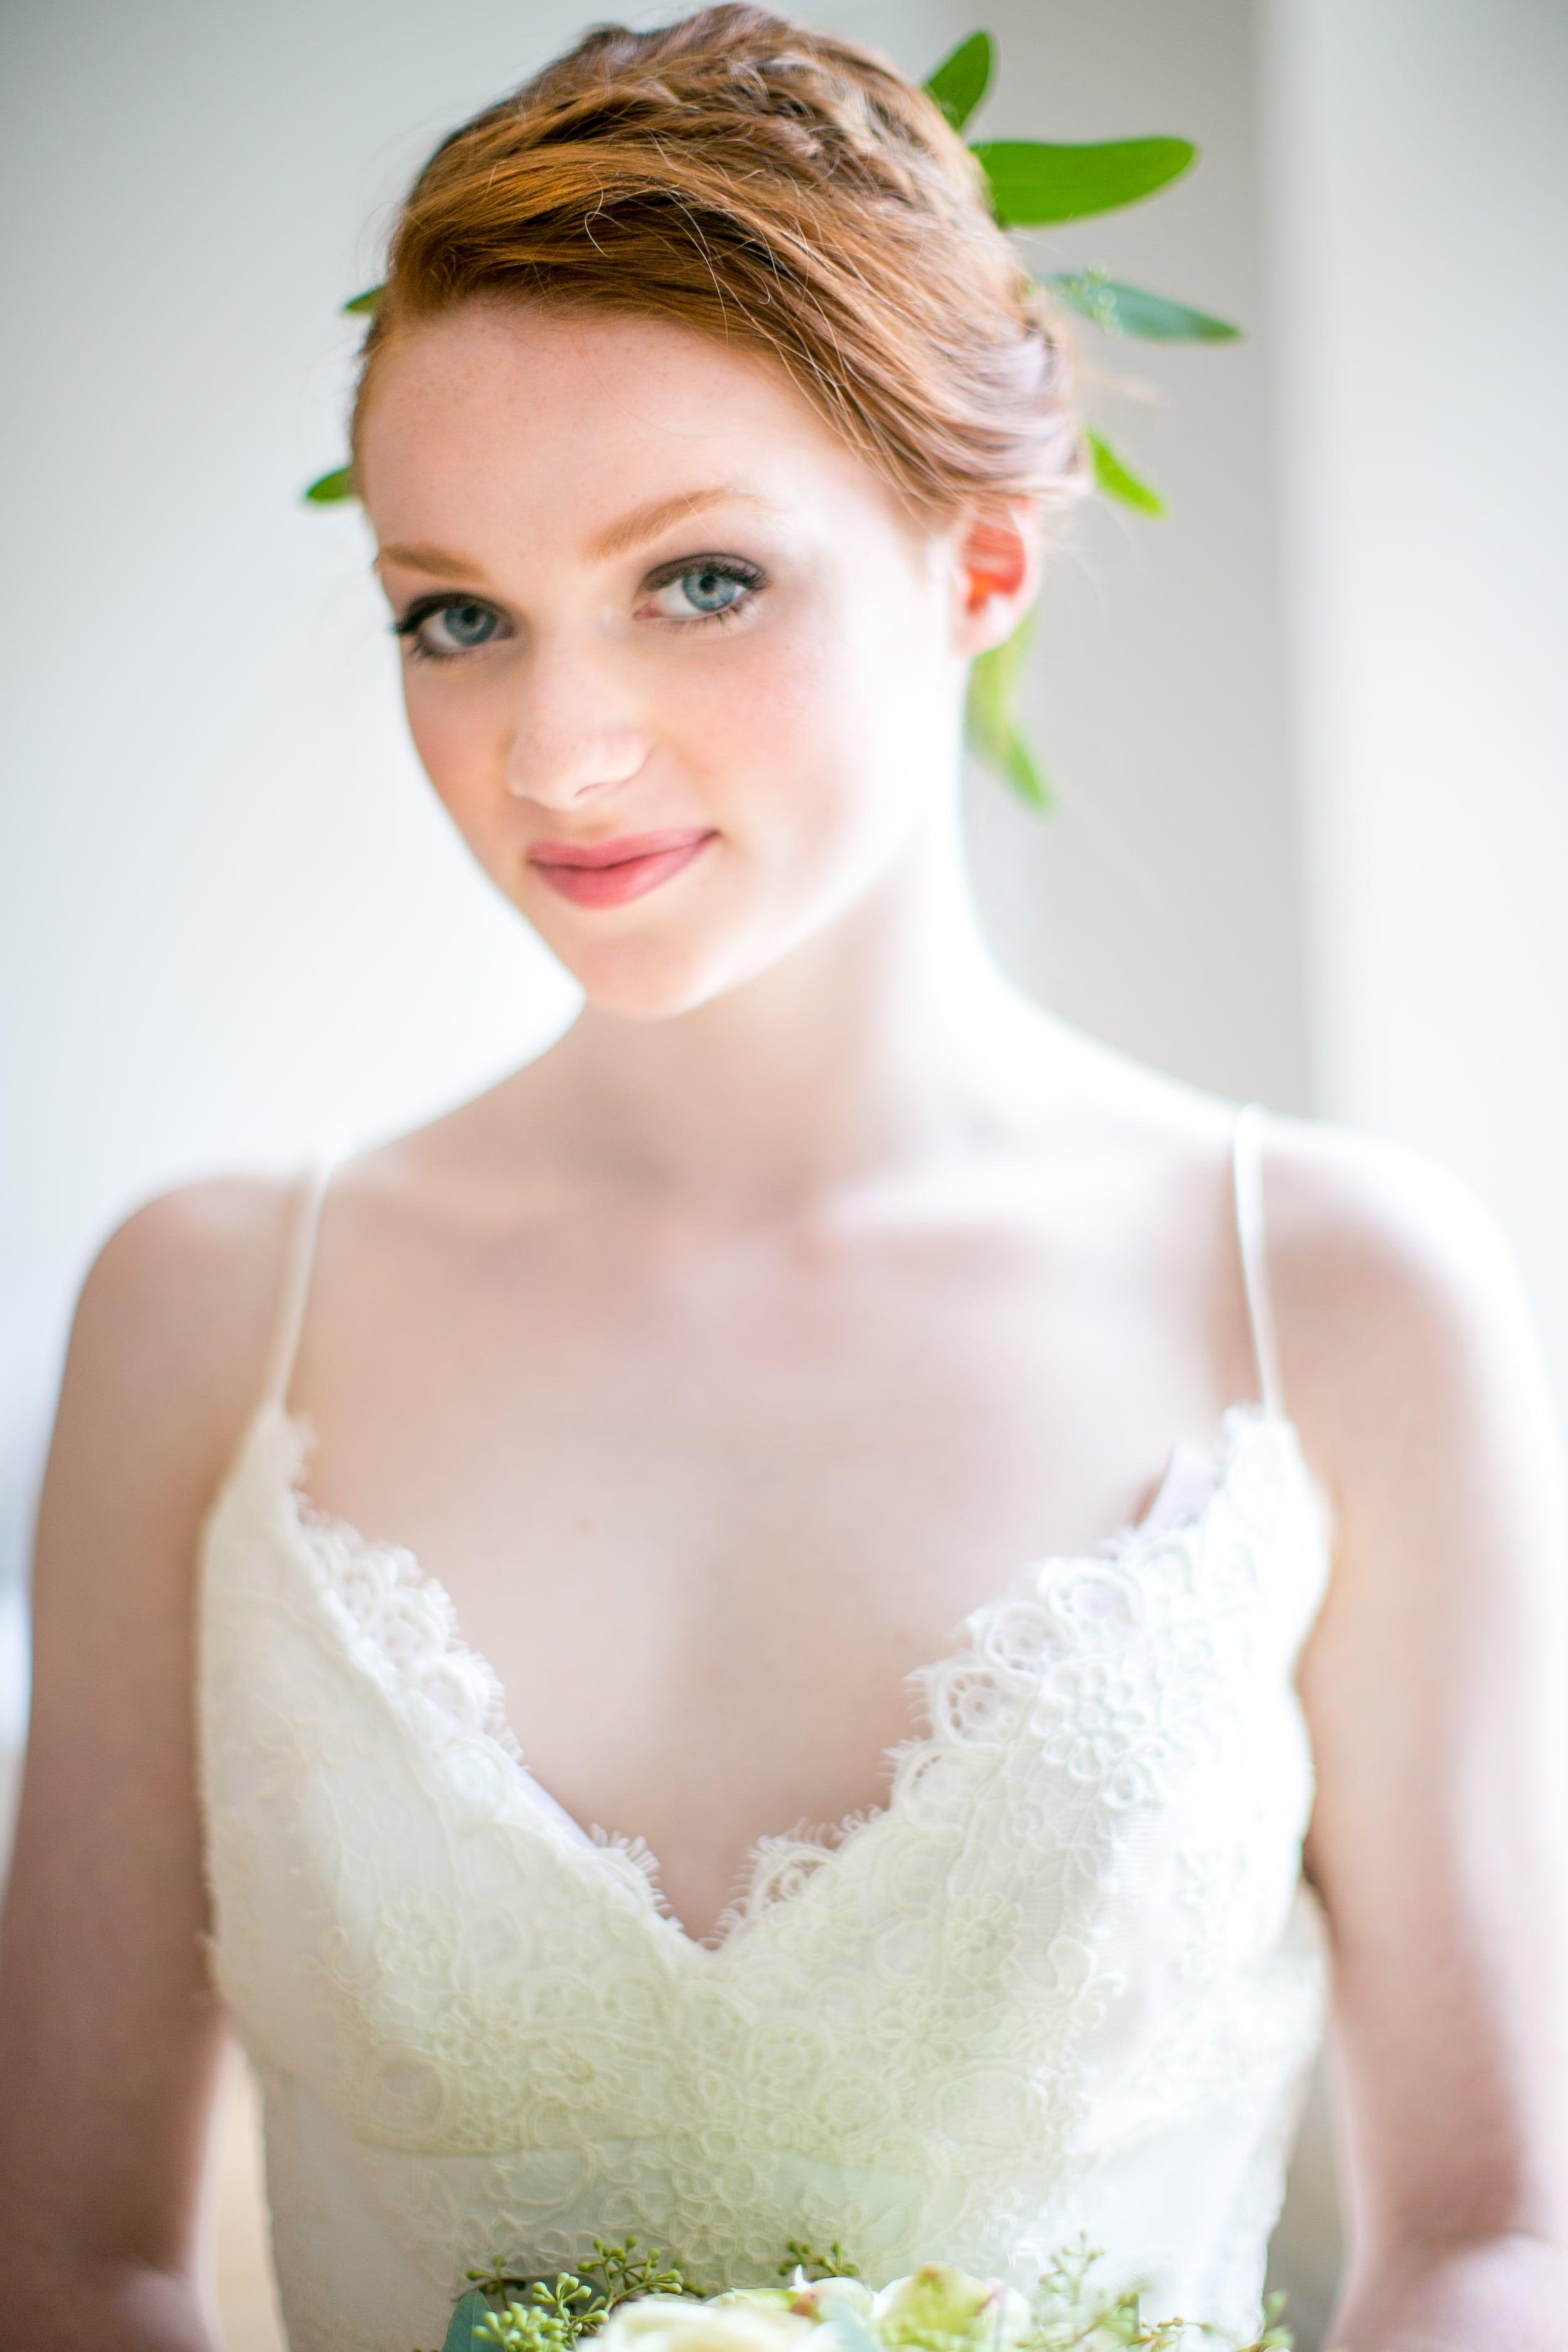 bride makeup and wedding dress photography 0037